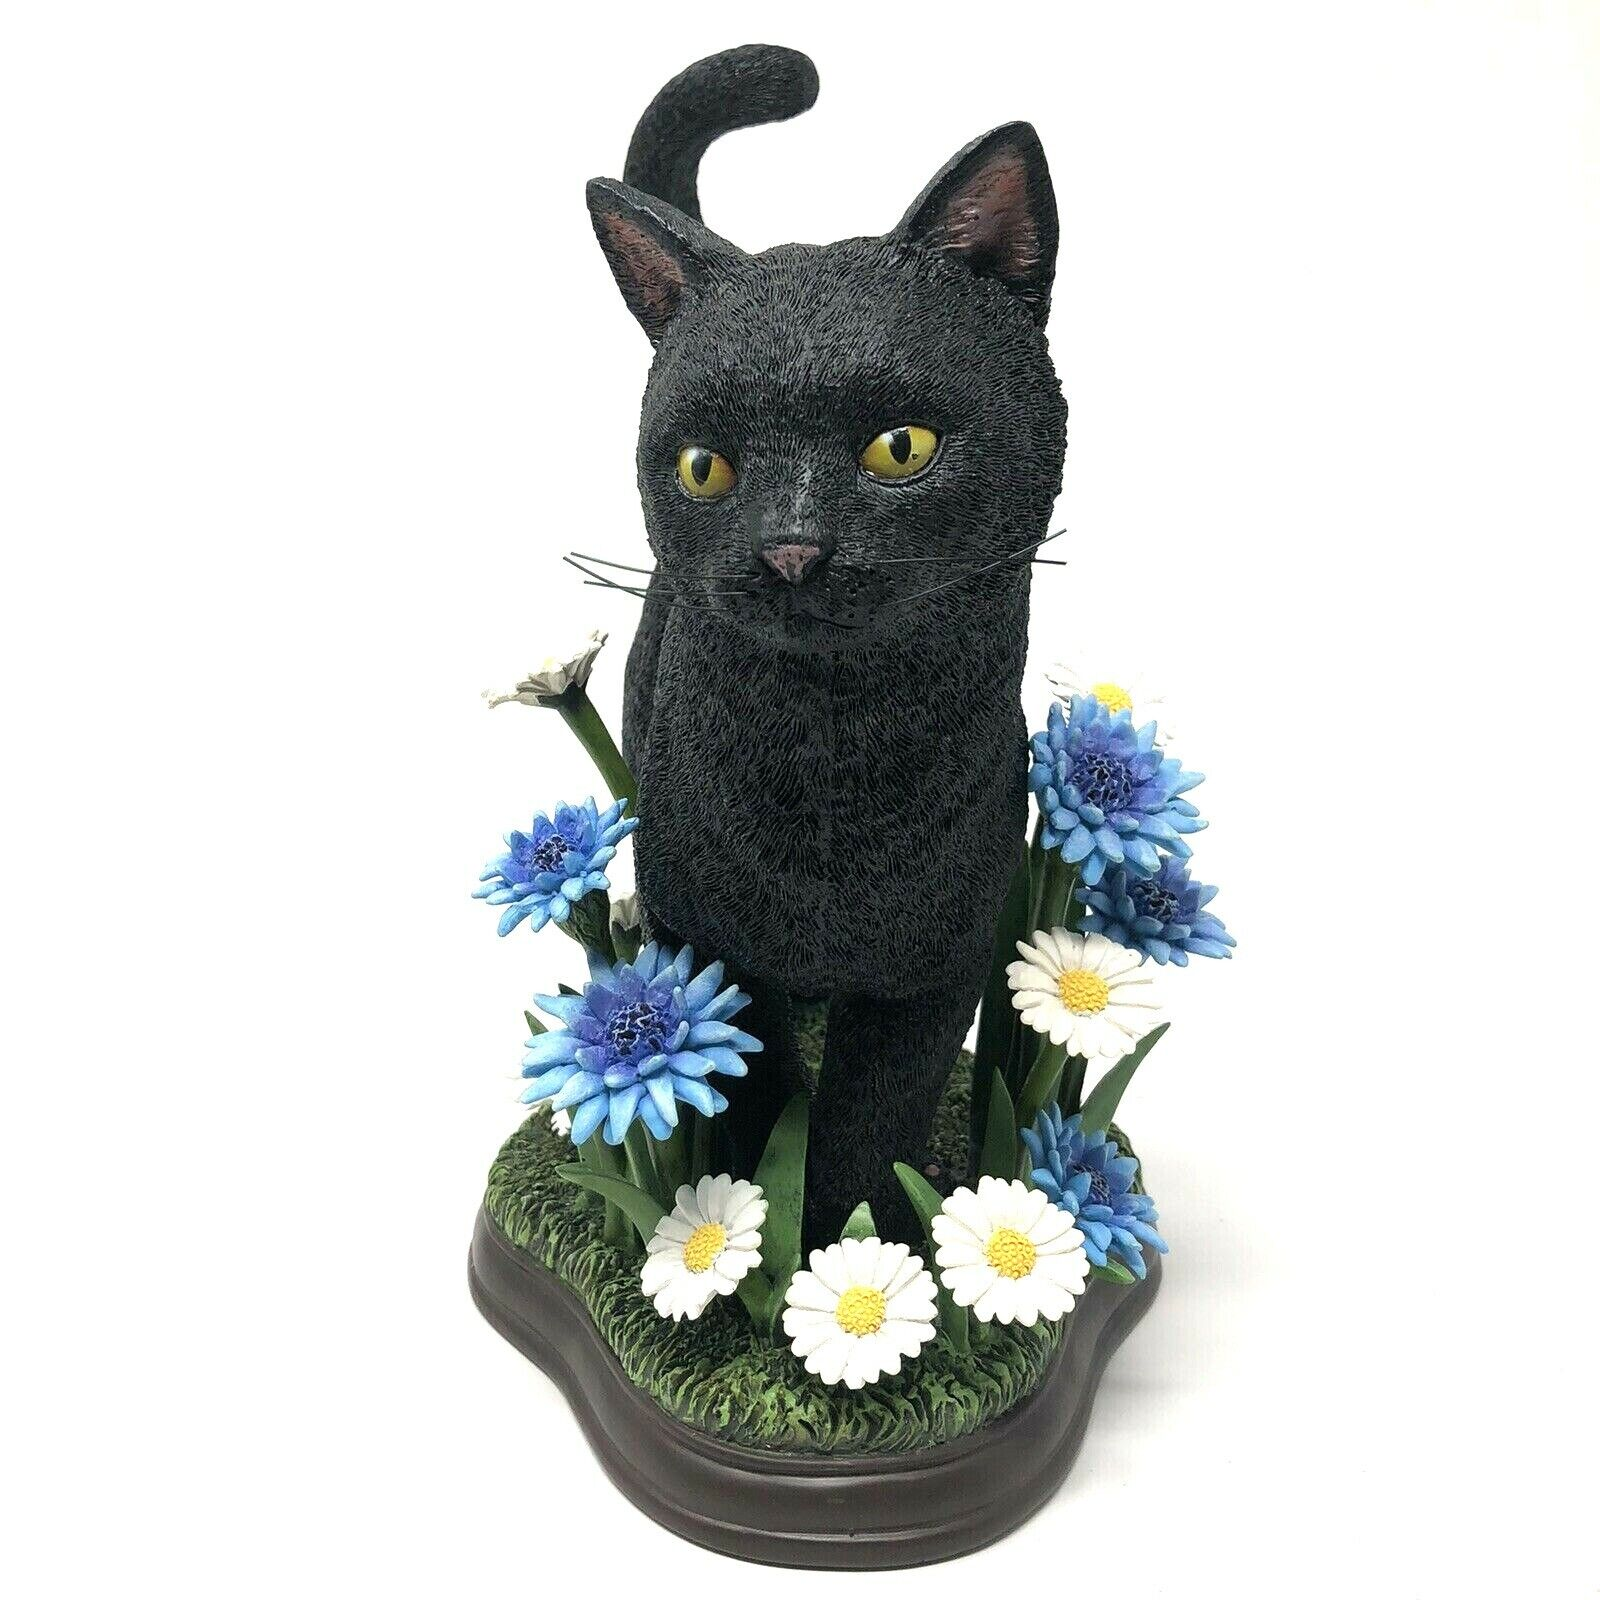 Danbury Mint In The Meadow Simon Mendez Black Cat Flowers Sculpture Figurine